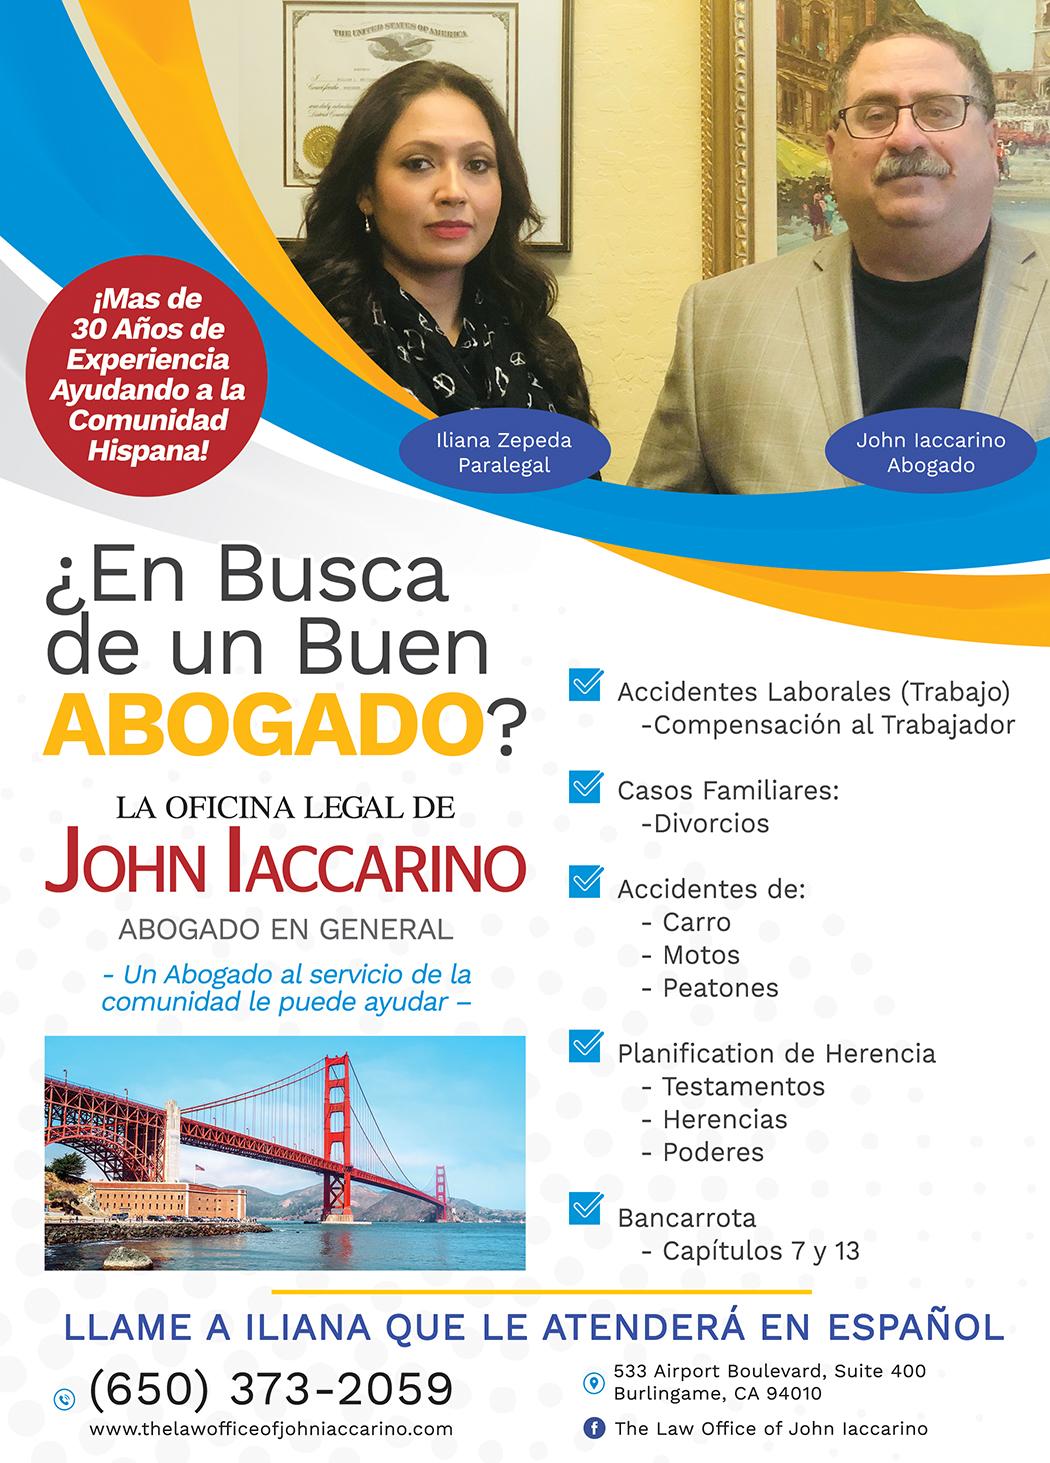 John Iaccarino 1 Pagina - JUNIO 2018 copy.jpg